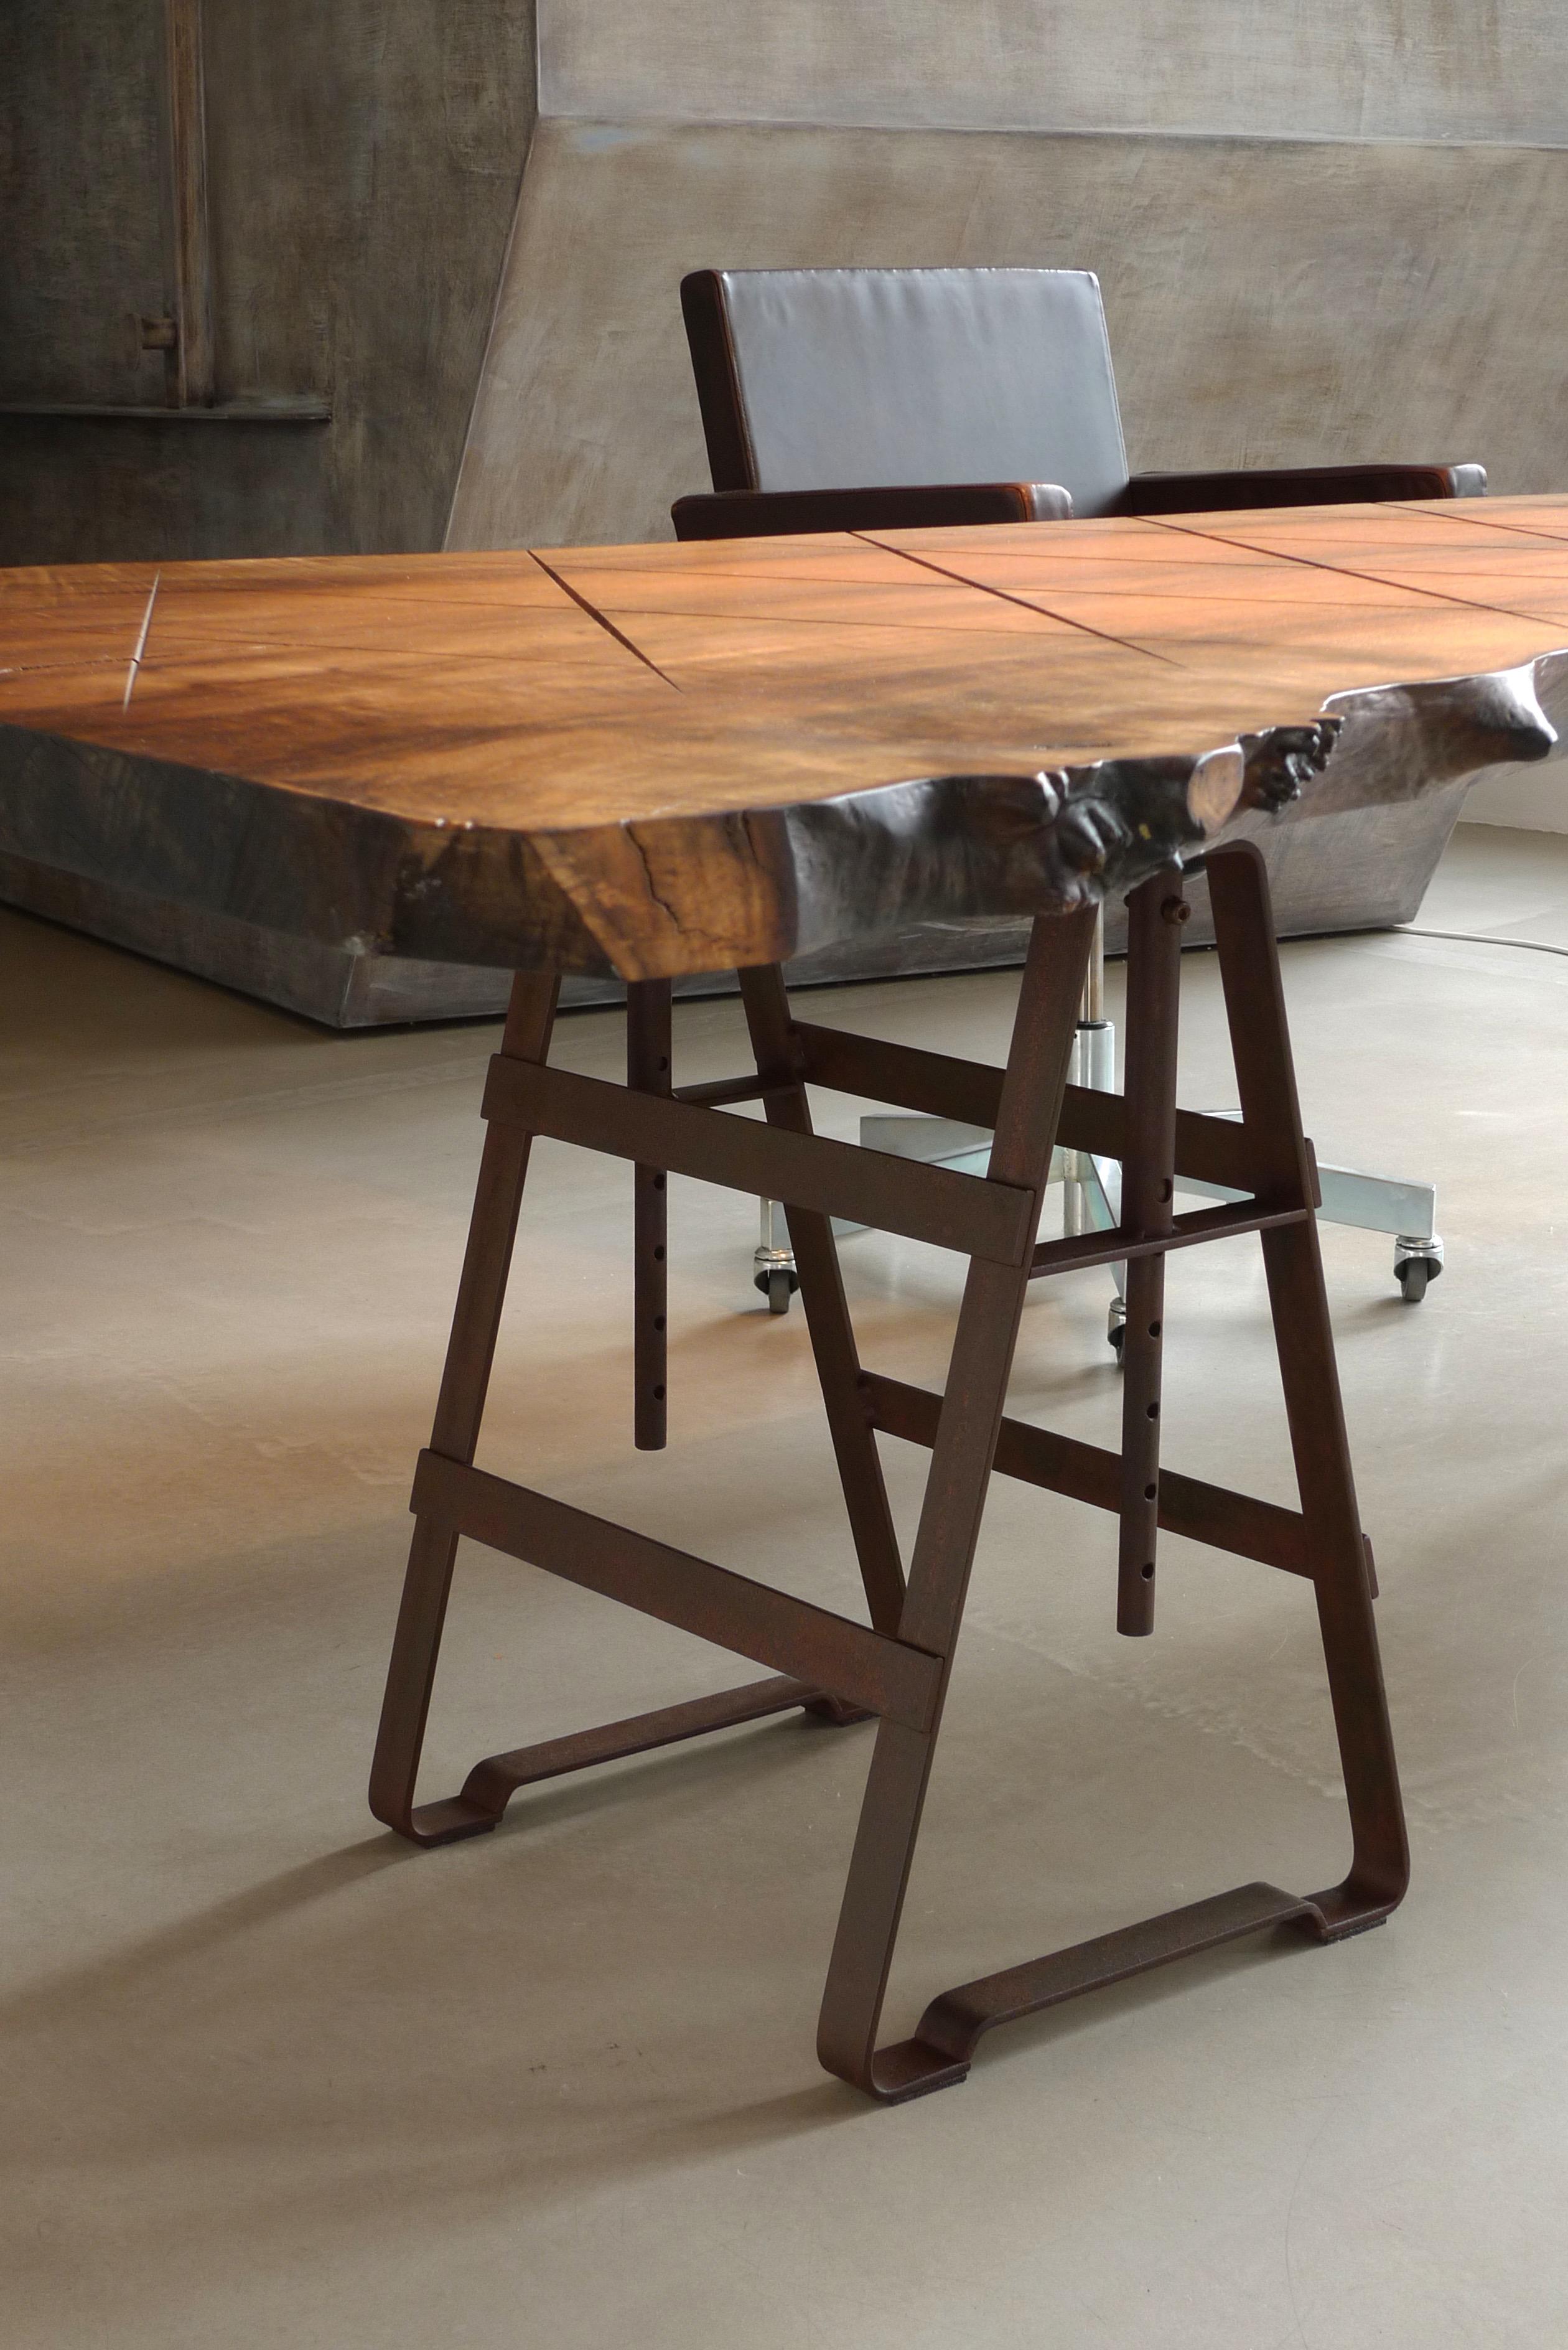 Lackaffe Rost Tischbock Tischgestell Stahl Atelier Haußmann